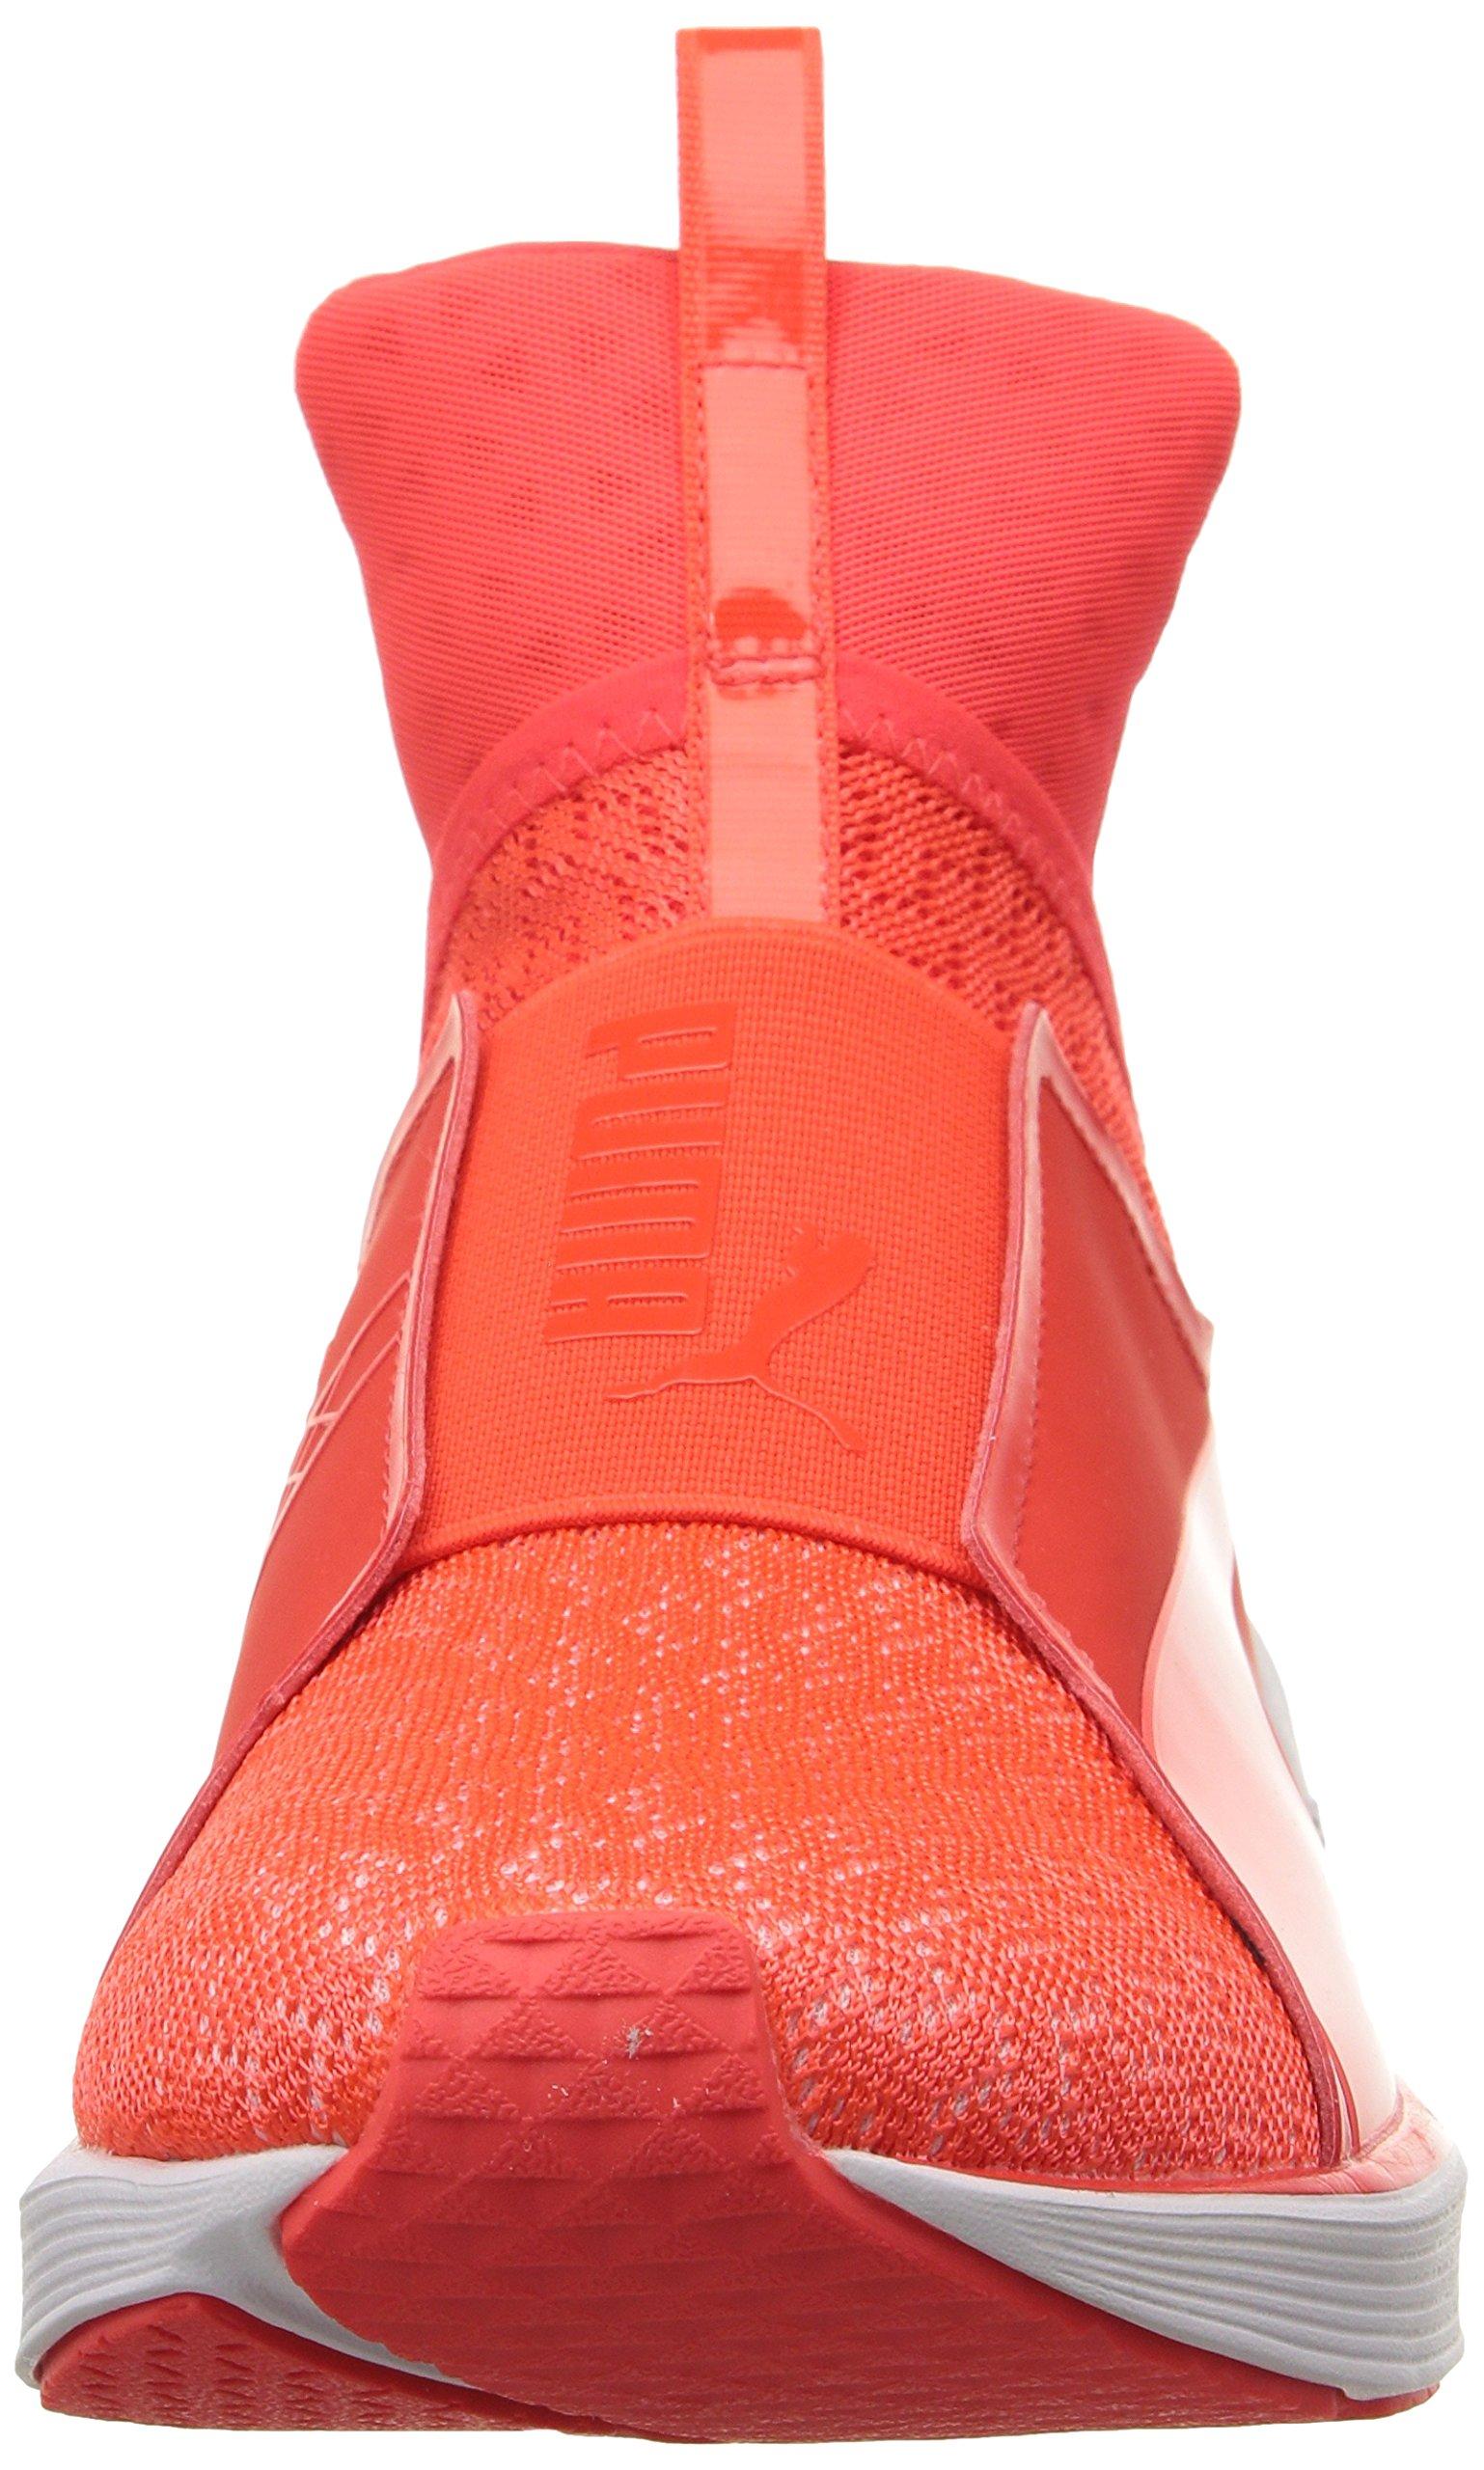 PUMA Women's Fierce Eng Mesh Cross-Trainer Shoe, Red Blast White, 5.5 M US by PUMA (Image #4)